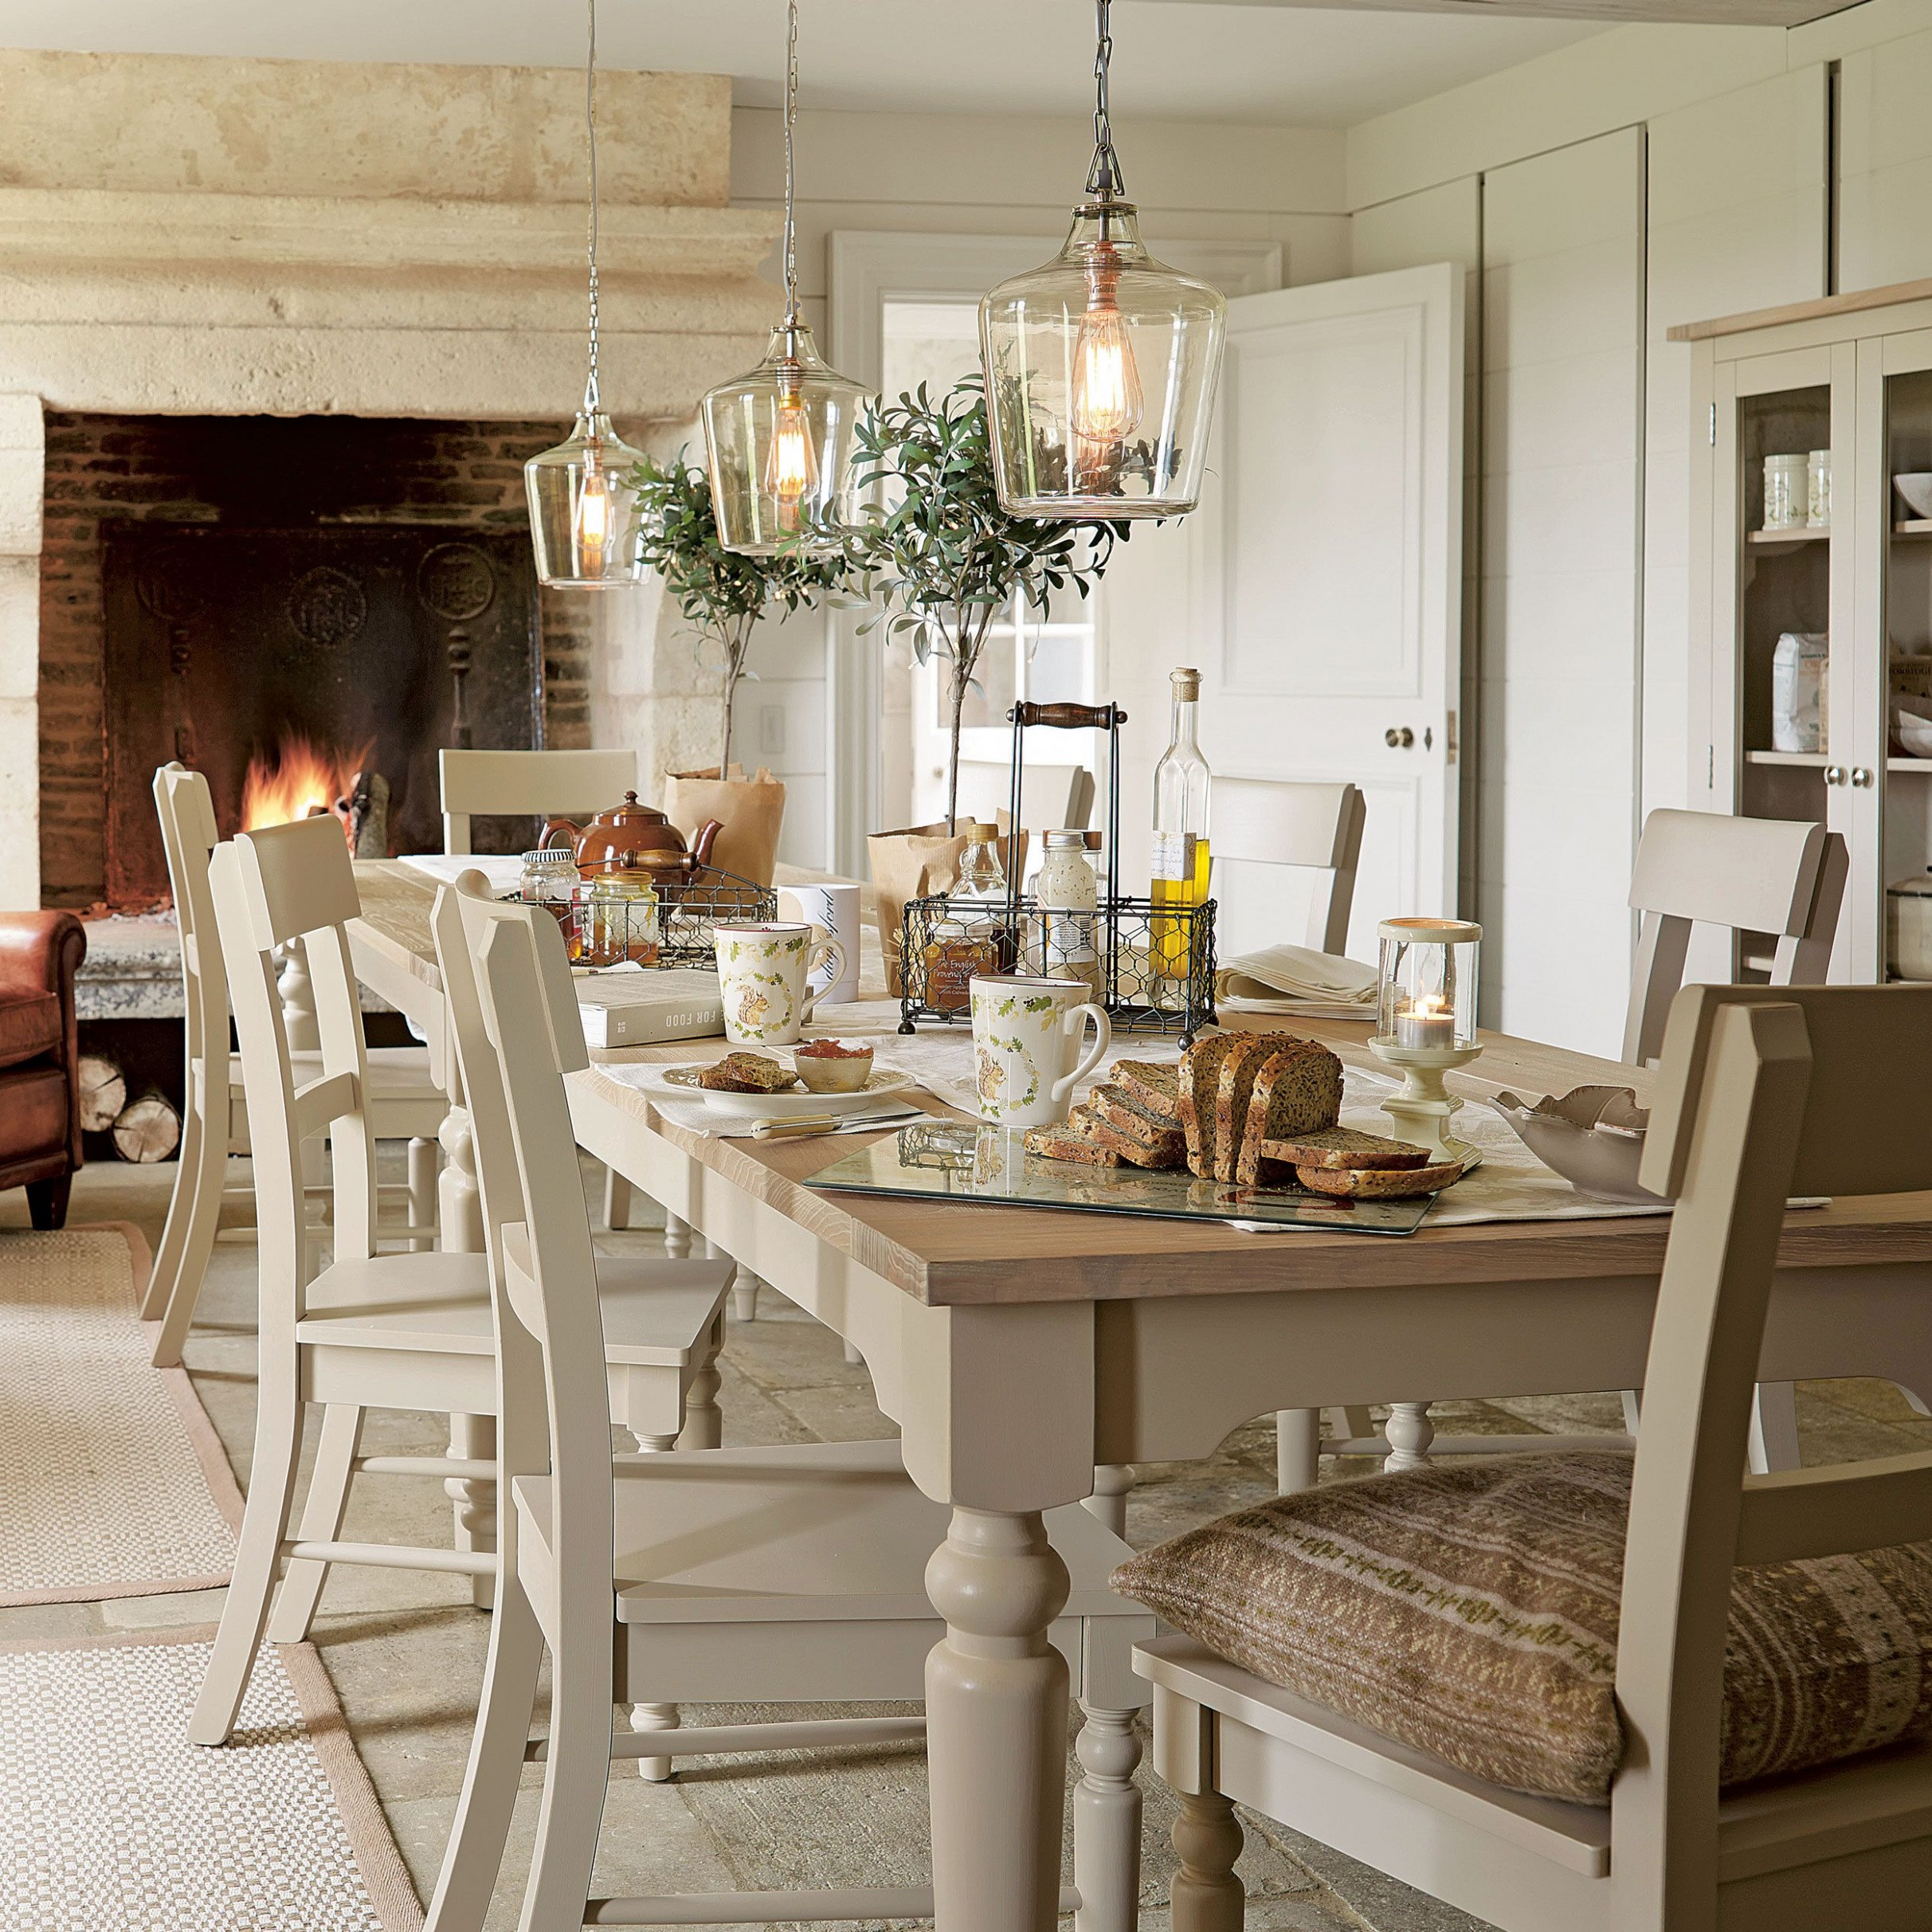 Kitchen lights - Laura Ashley  Glass kitchen tables, Chic kitchen  - Dining Room Ideas Laura Ashley